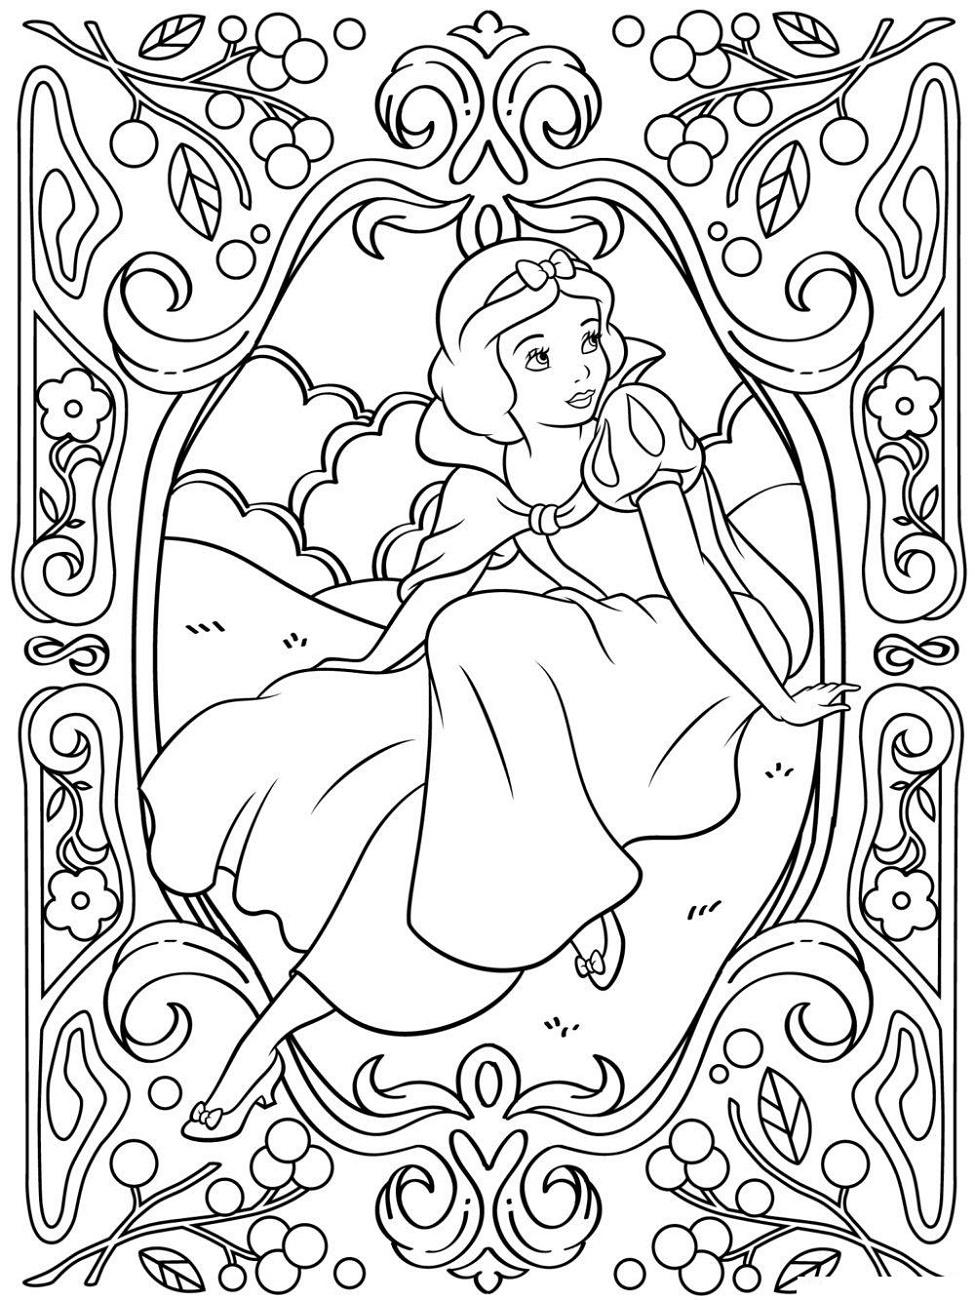 Adult Disney Coloring Pages Princess